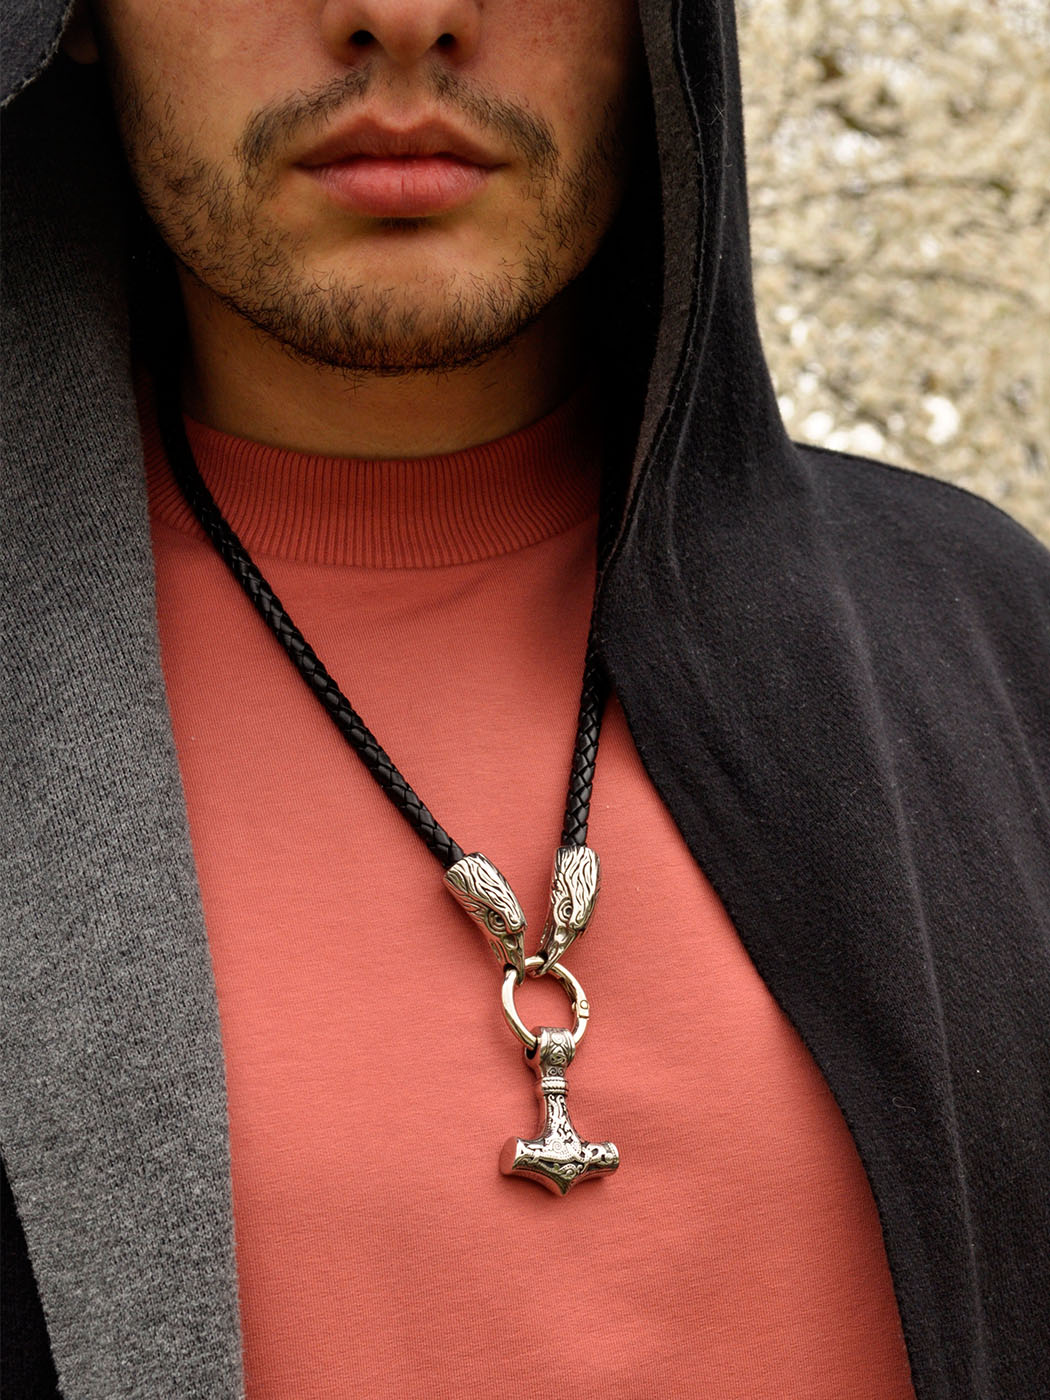 Viking Raven Necklace New York Amazon Coupons